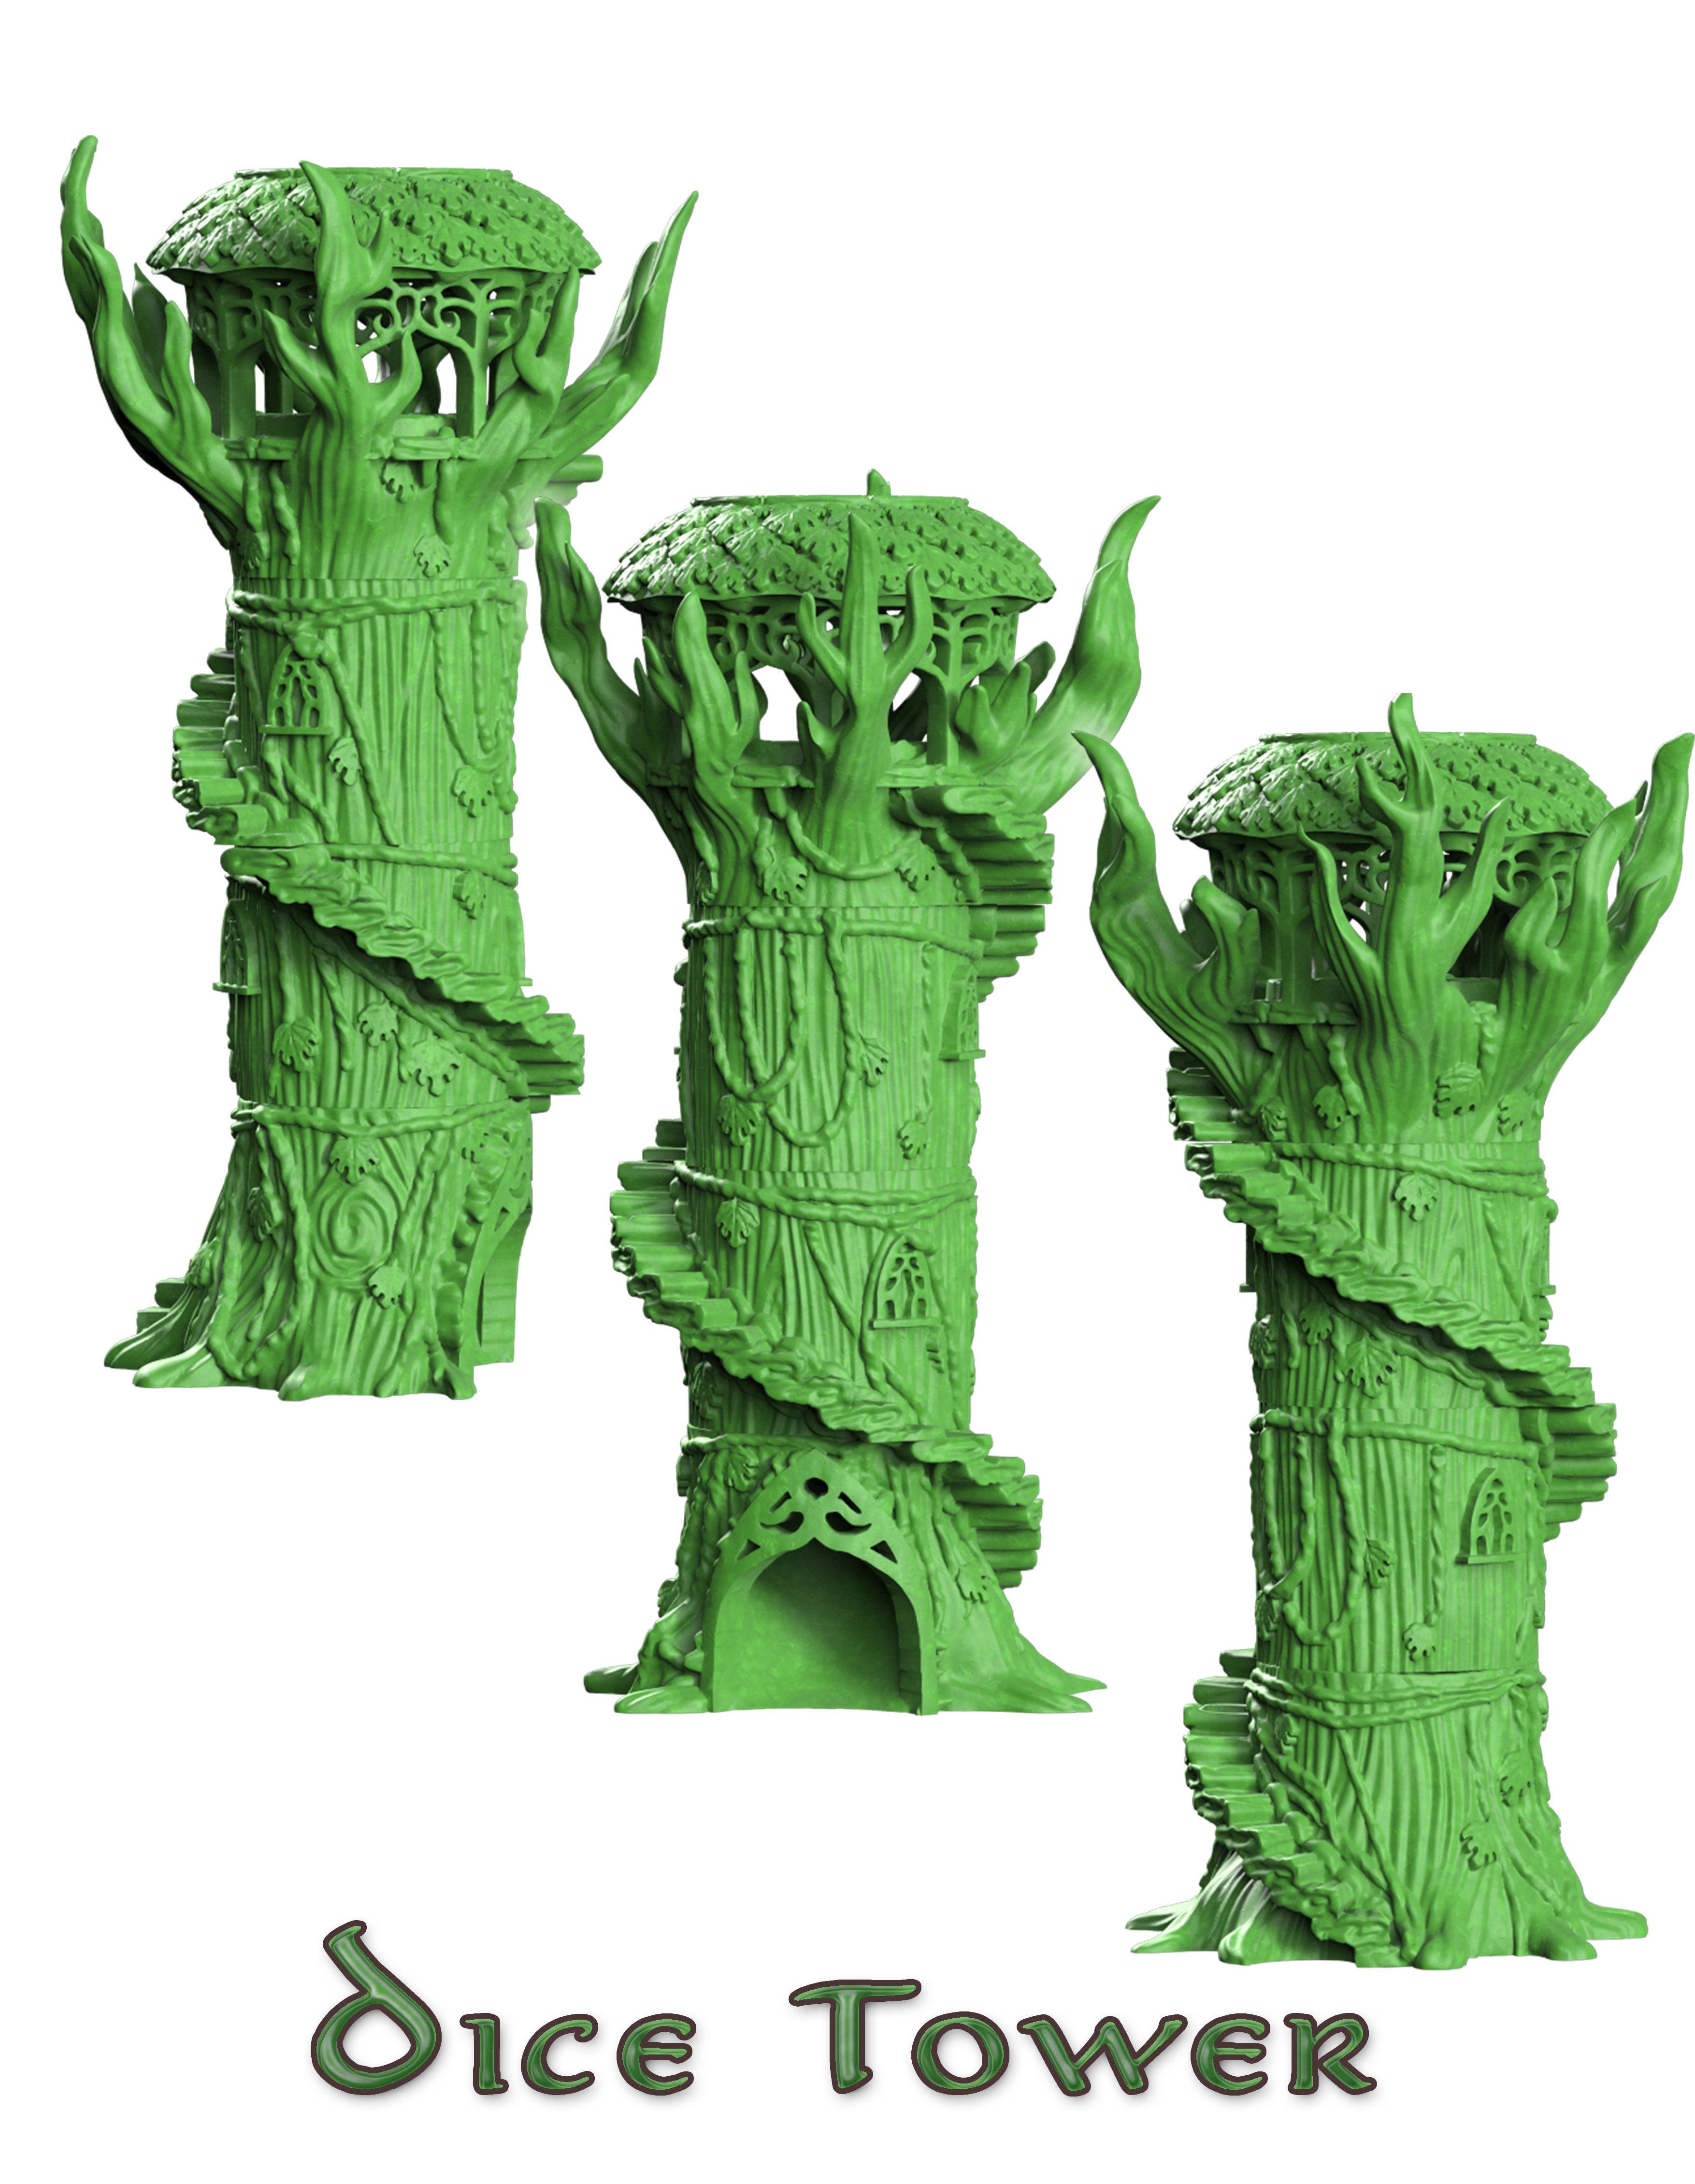 Dice tower wood elf